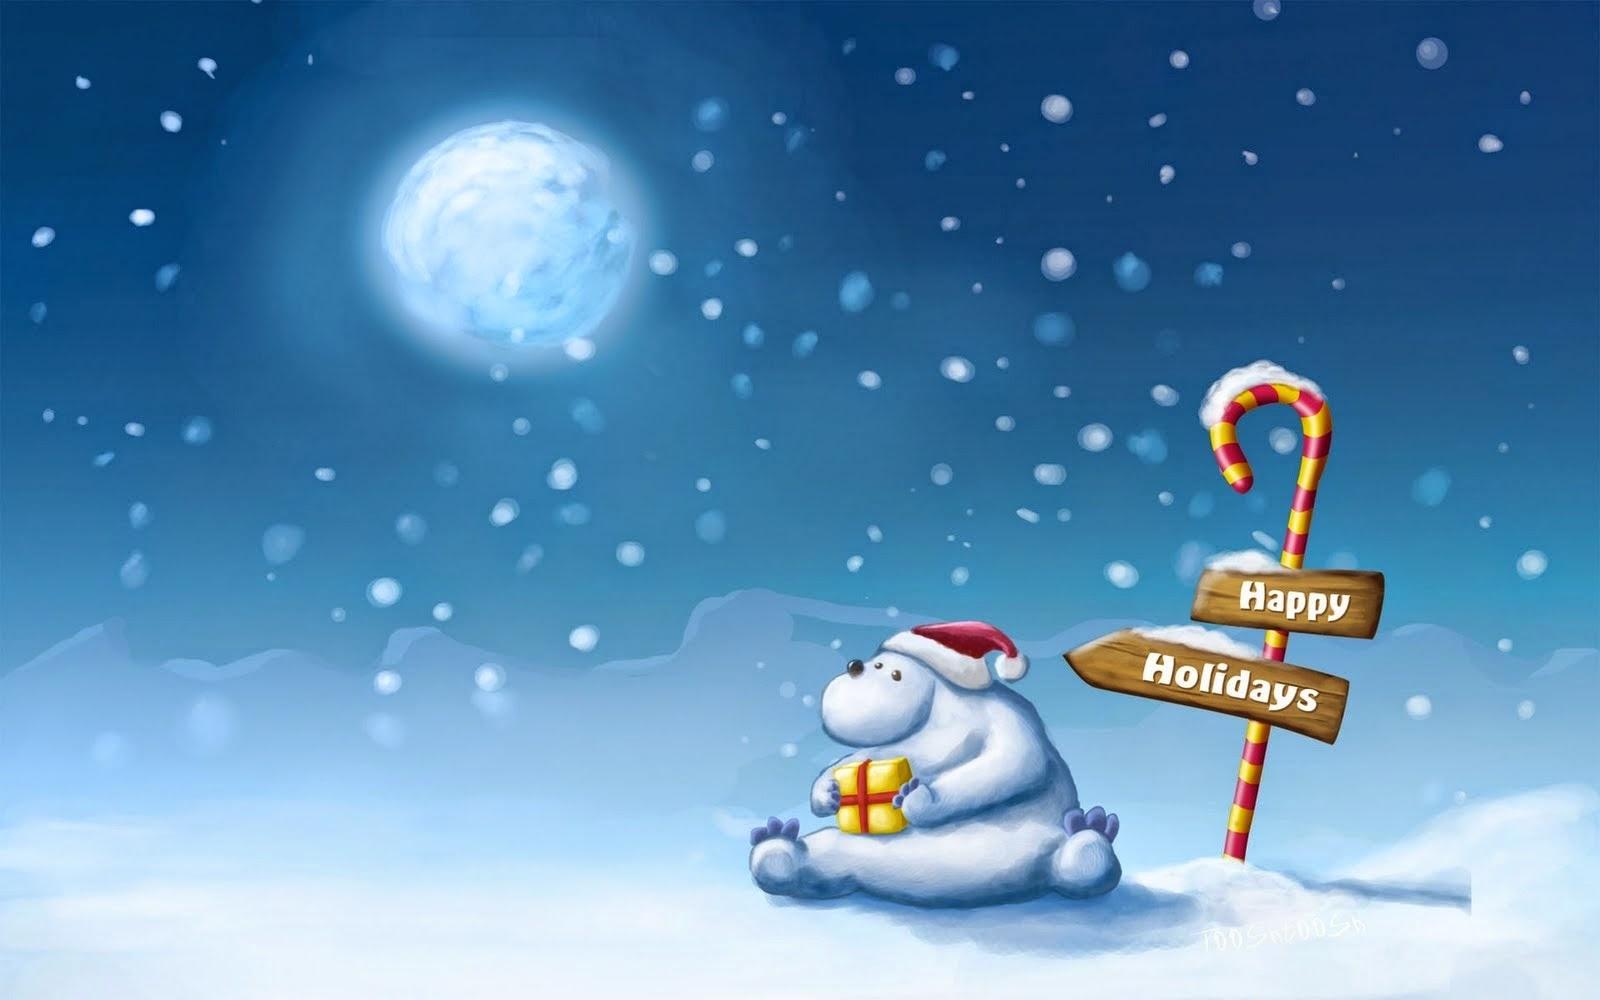 Christmas Santa Hd Wallpapers Imageslist Com Christmas Wallpapers Part 7